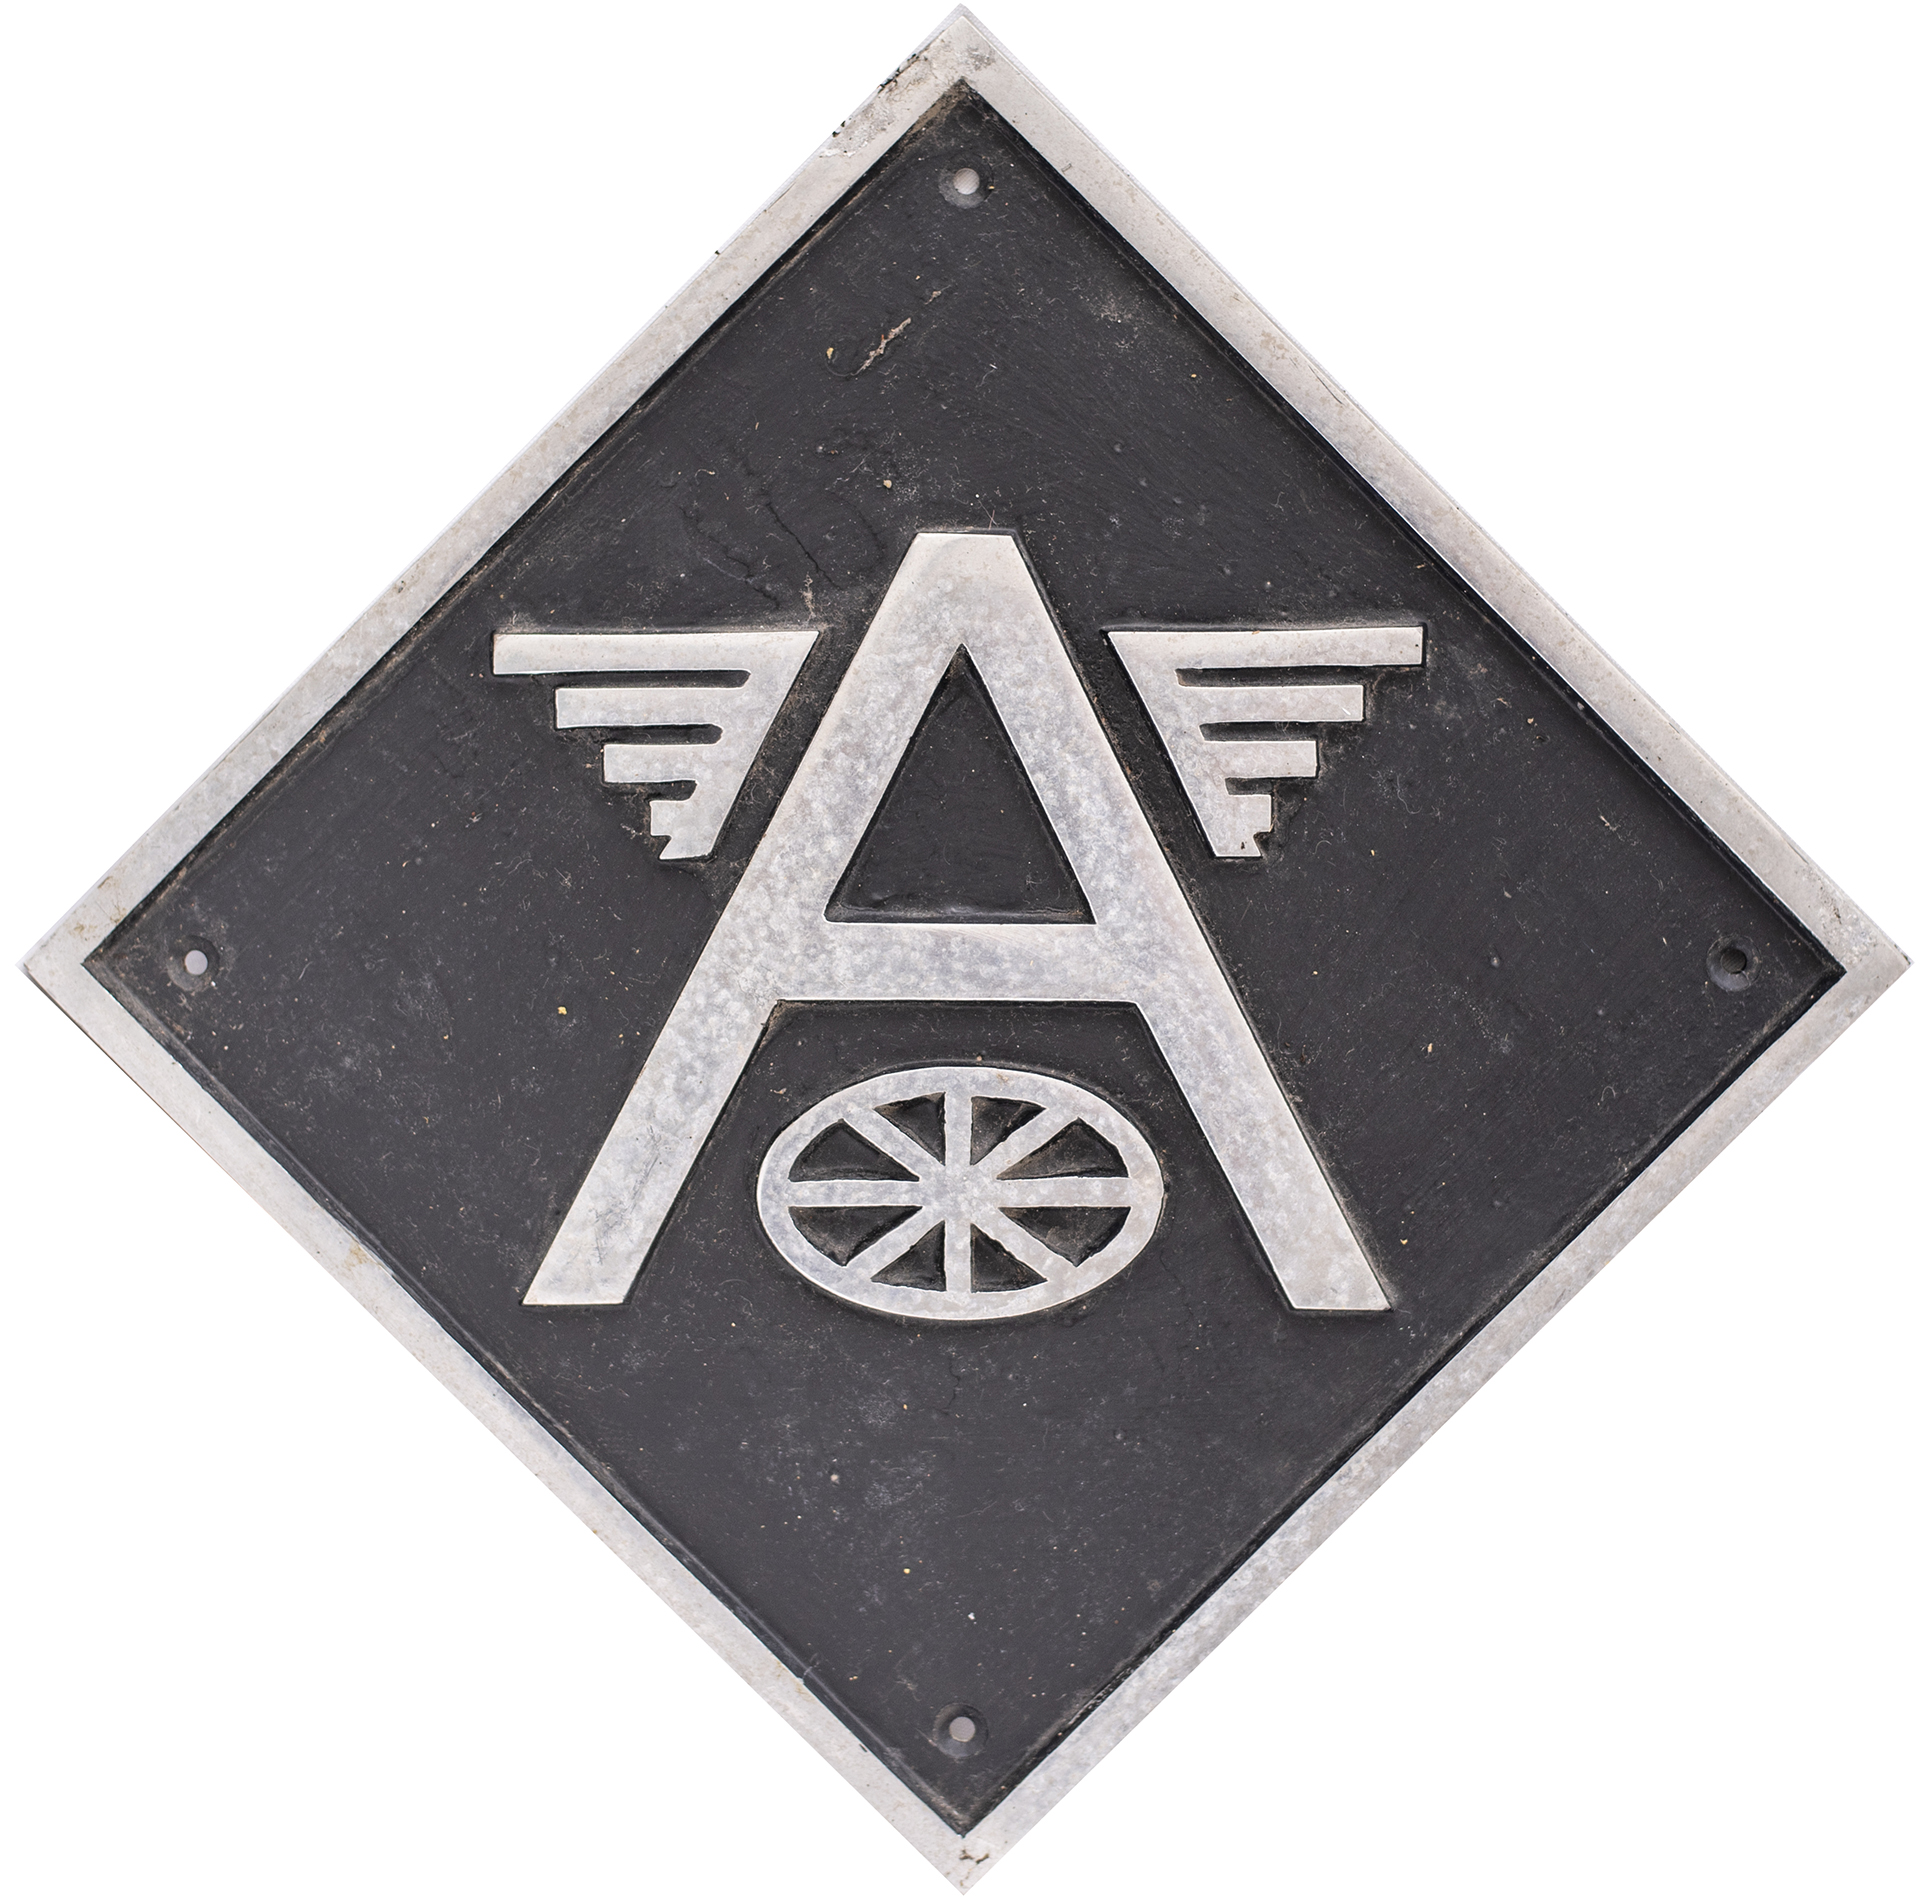 British Rail cast aluminium depot plaque for Allerton depicting the winged A. Square cast